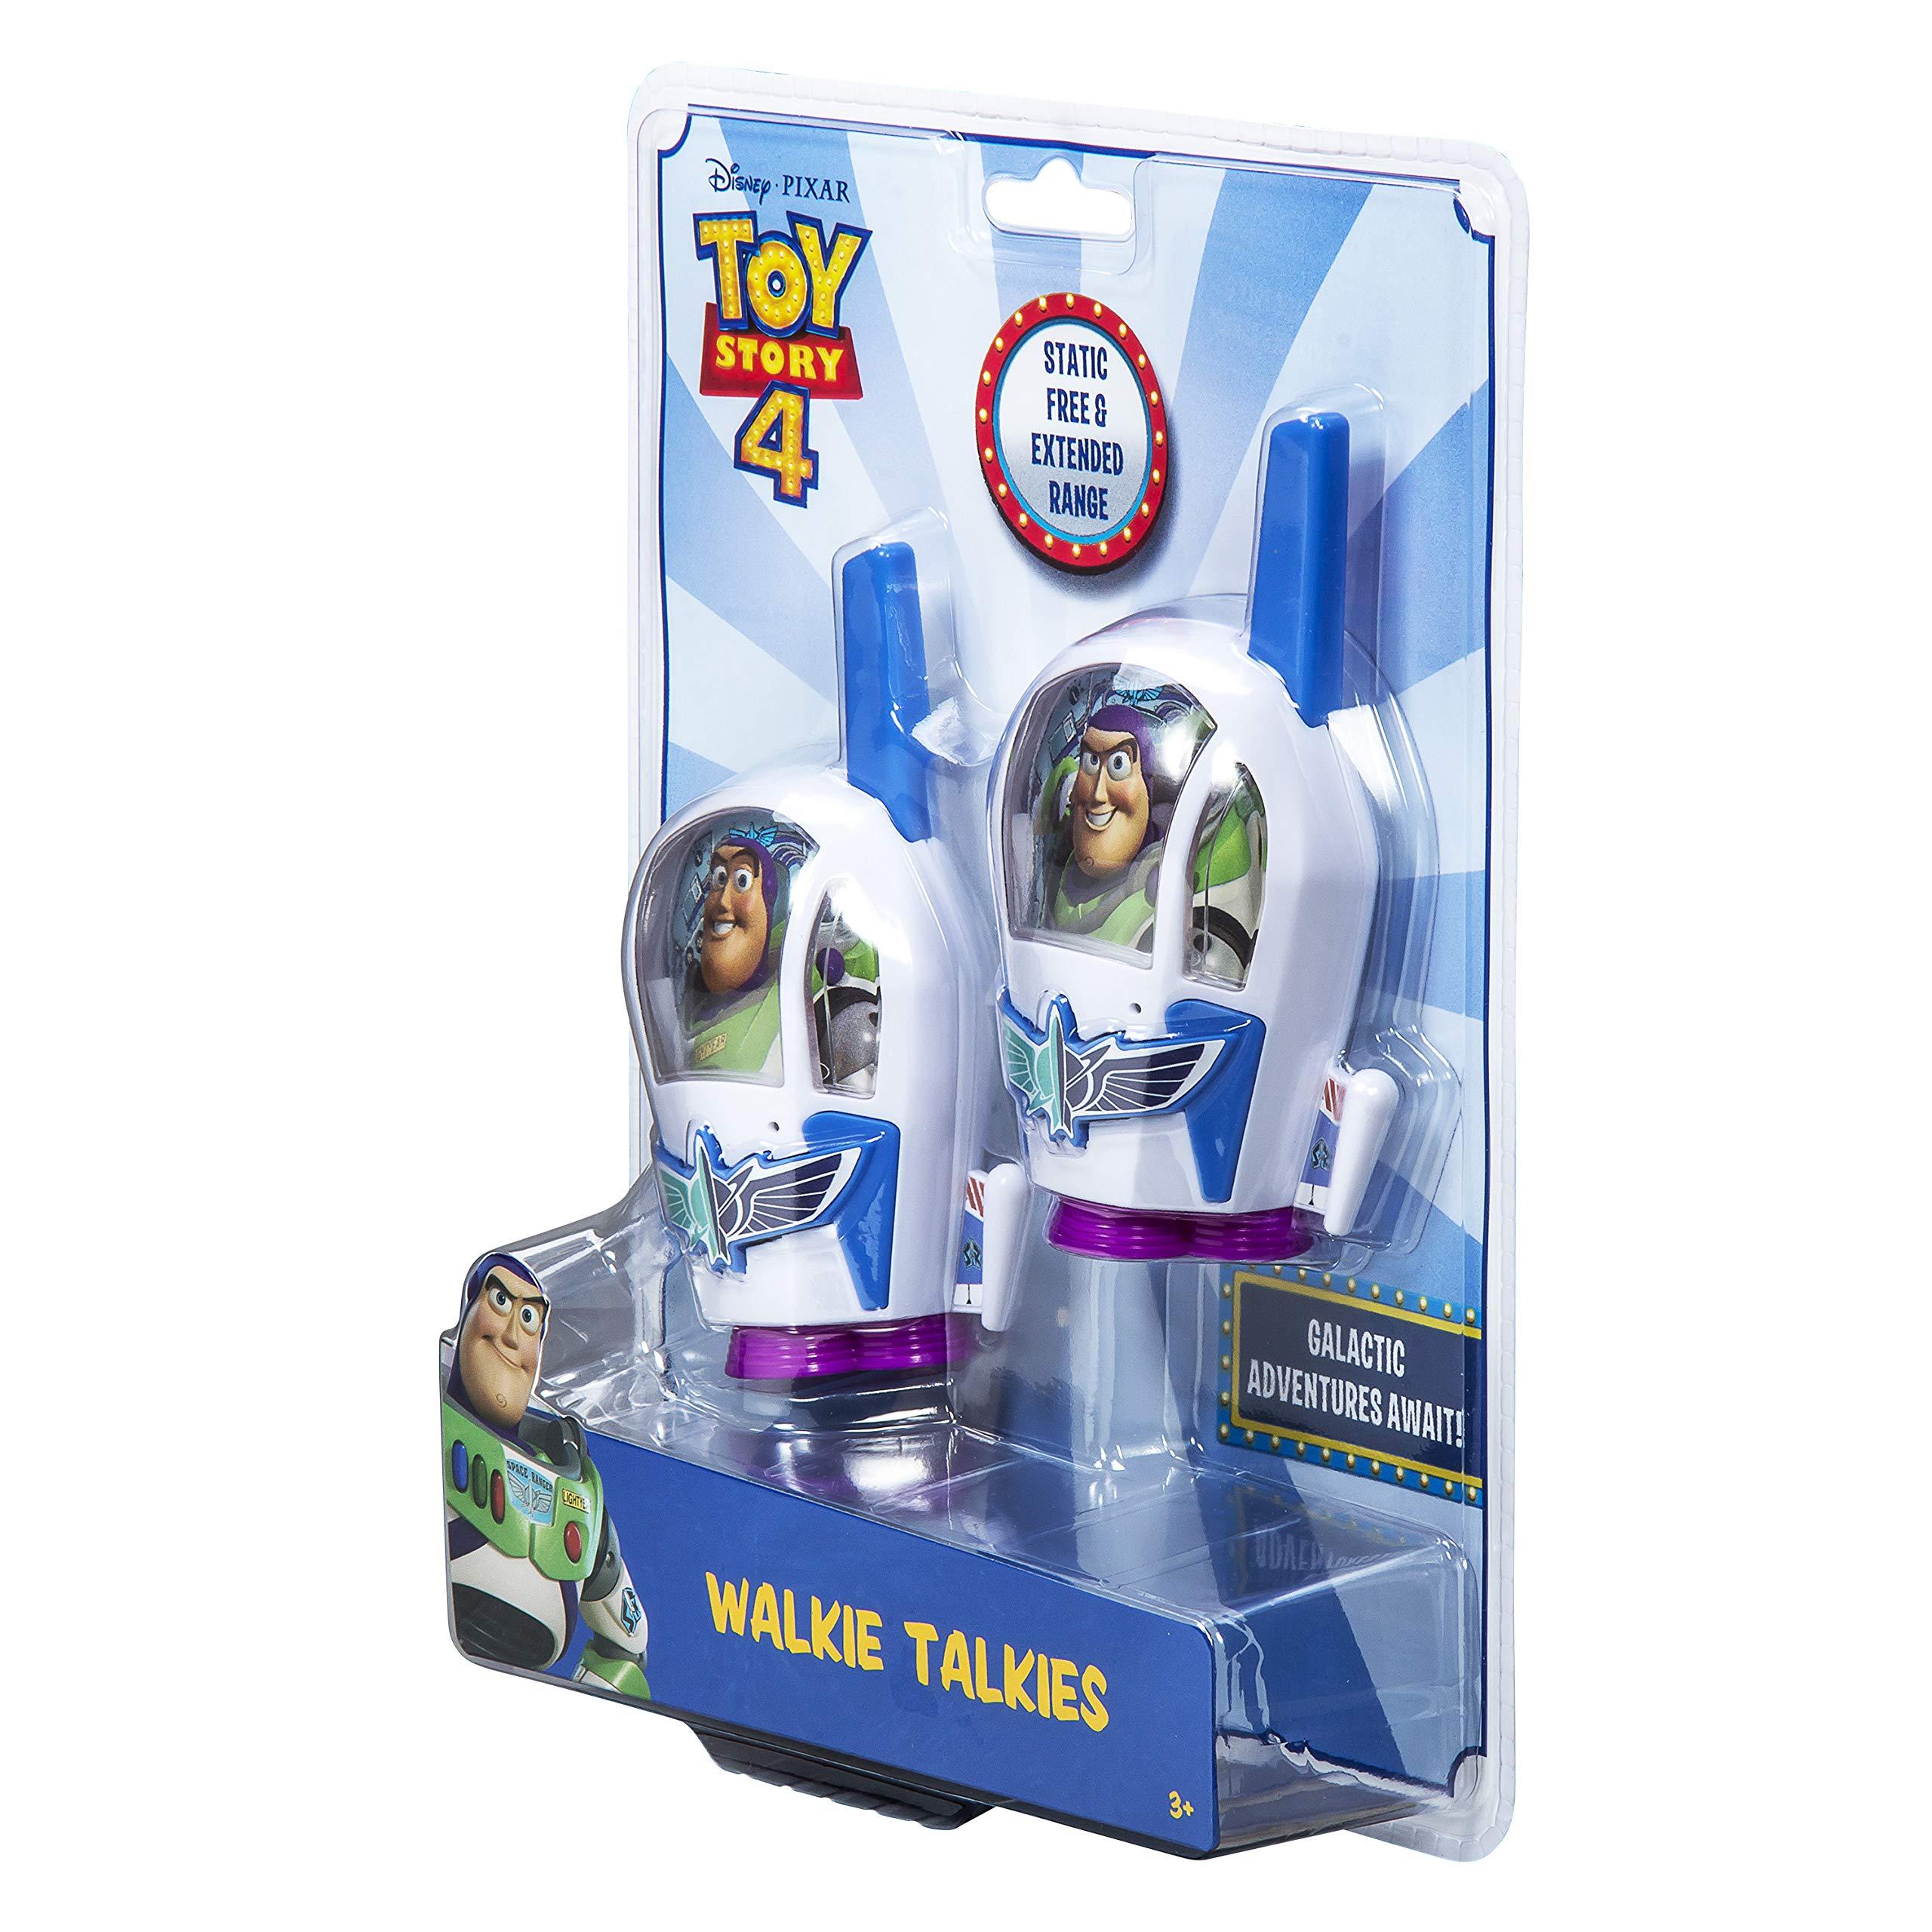 Toy Story 4 Buzz Lightyear Kids Walkie Talkies for Kids Static Free Extended Range Kid Friendly Easy to Use 2 Way Radio Toy Handheld Walkie Talkies Team Work Play Indoors or Outdoors by eKids (Image #7)